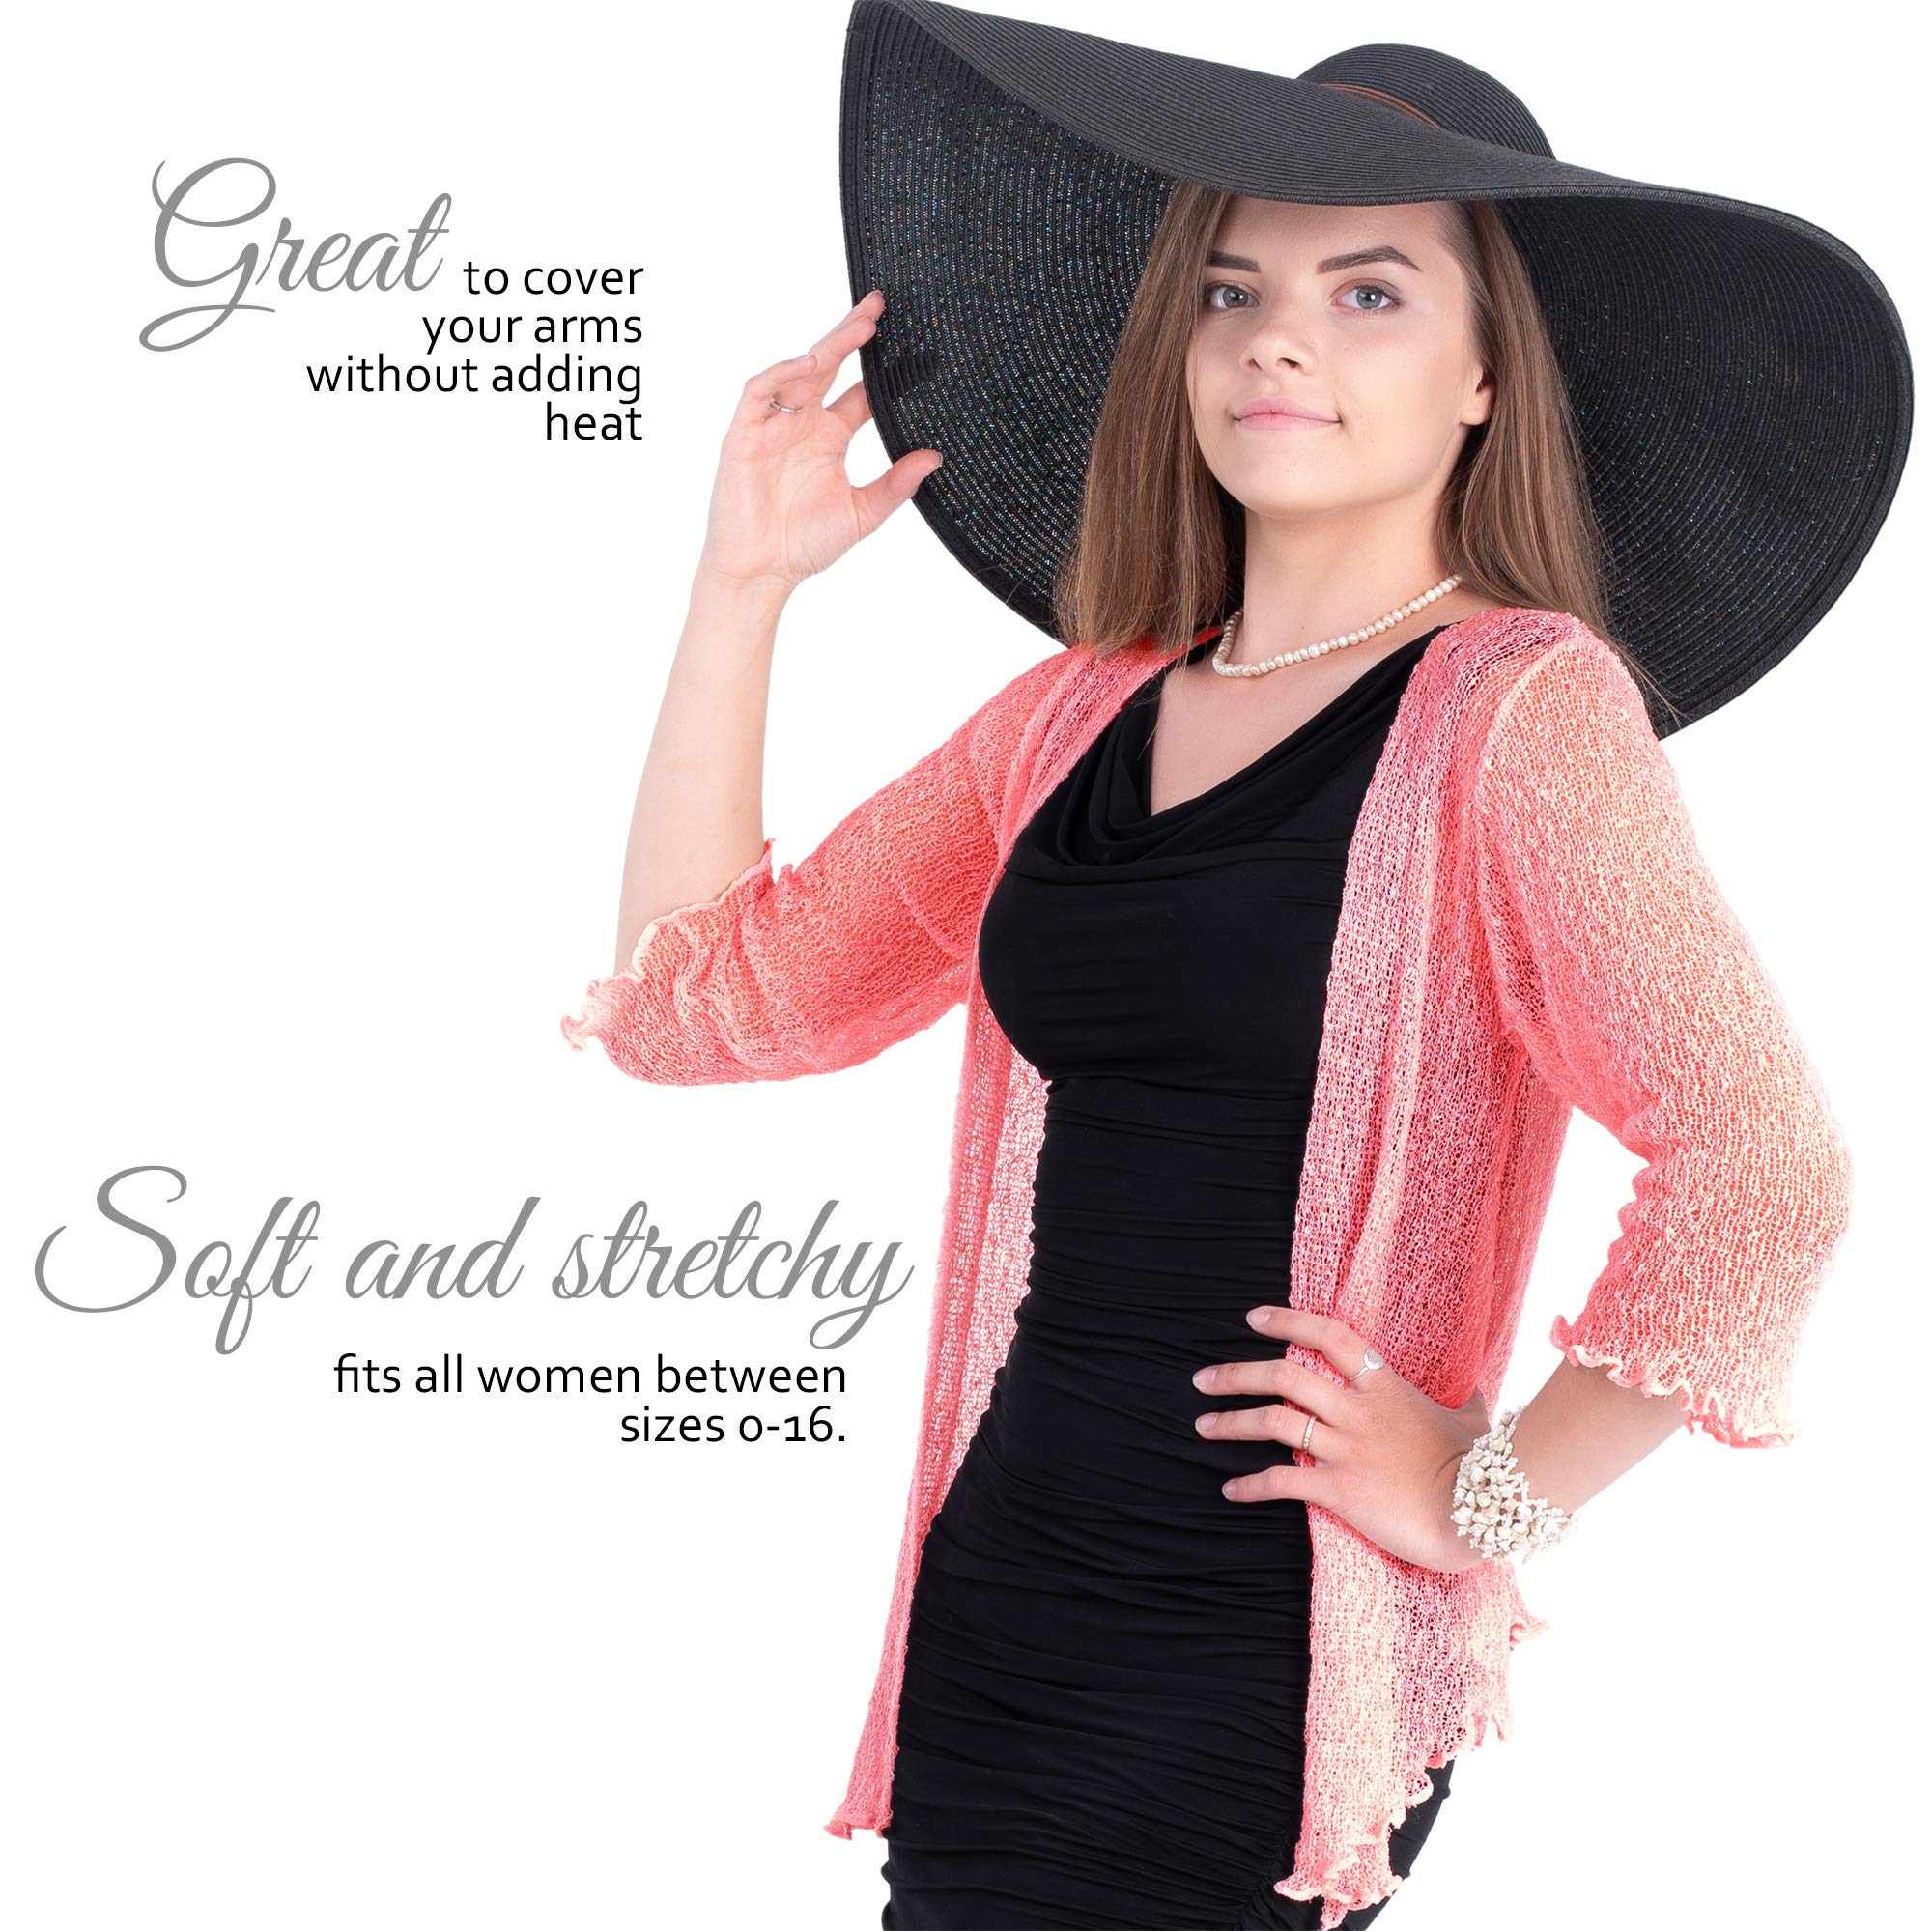 Boho Village Lightweight Cardigans for Women - 3/4 Sleeve Shrugs for Dresses. Dark Pink/Salmon Pink Size S-XL by Boho Village (Image #2)